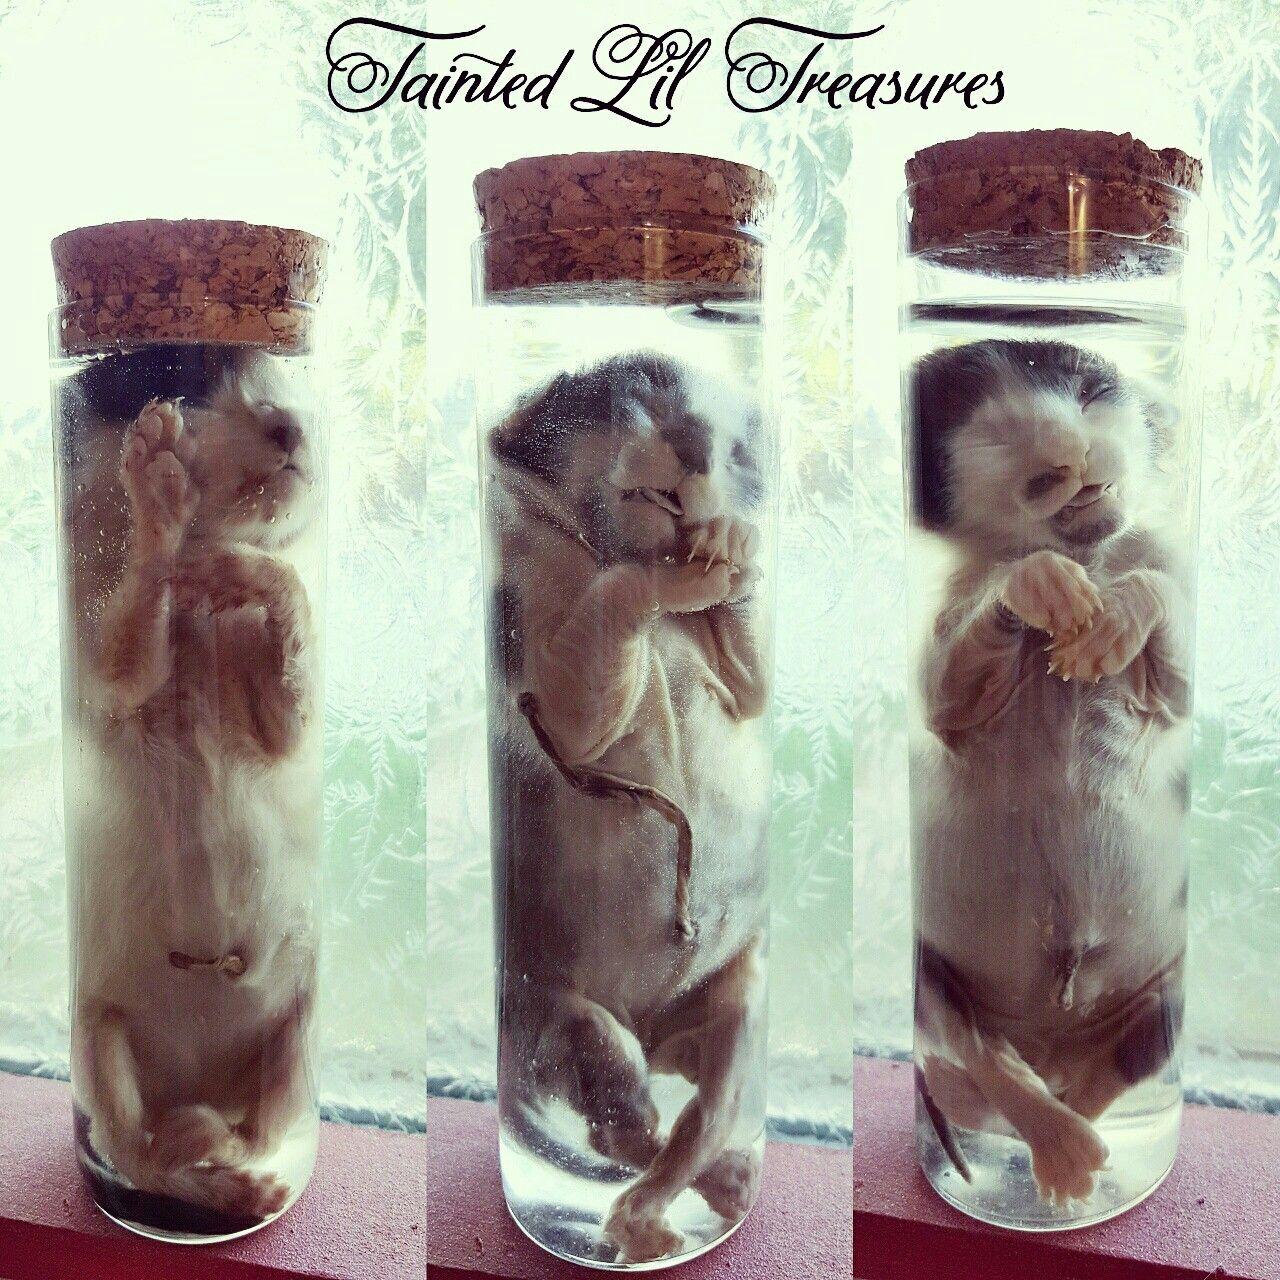 Stillborn Kittens Preserved By Taintedliltreasures On Instagram Taxidermy Art Kittens Oddities